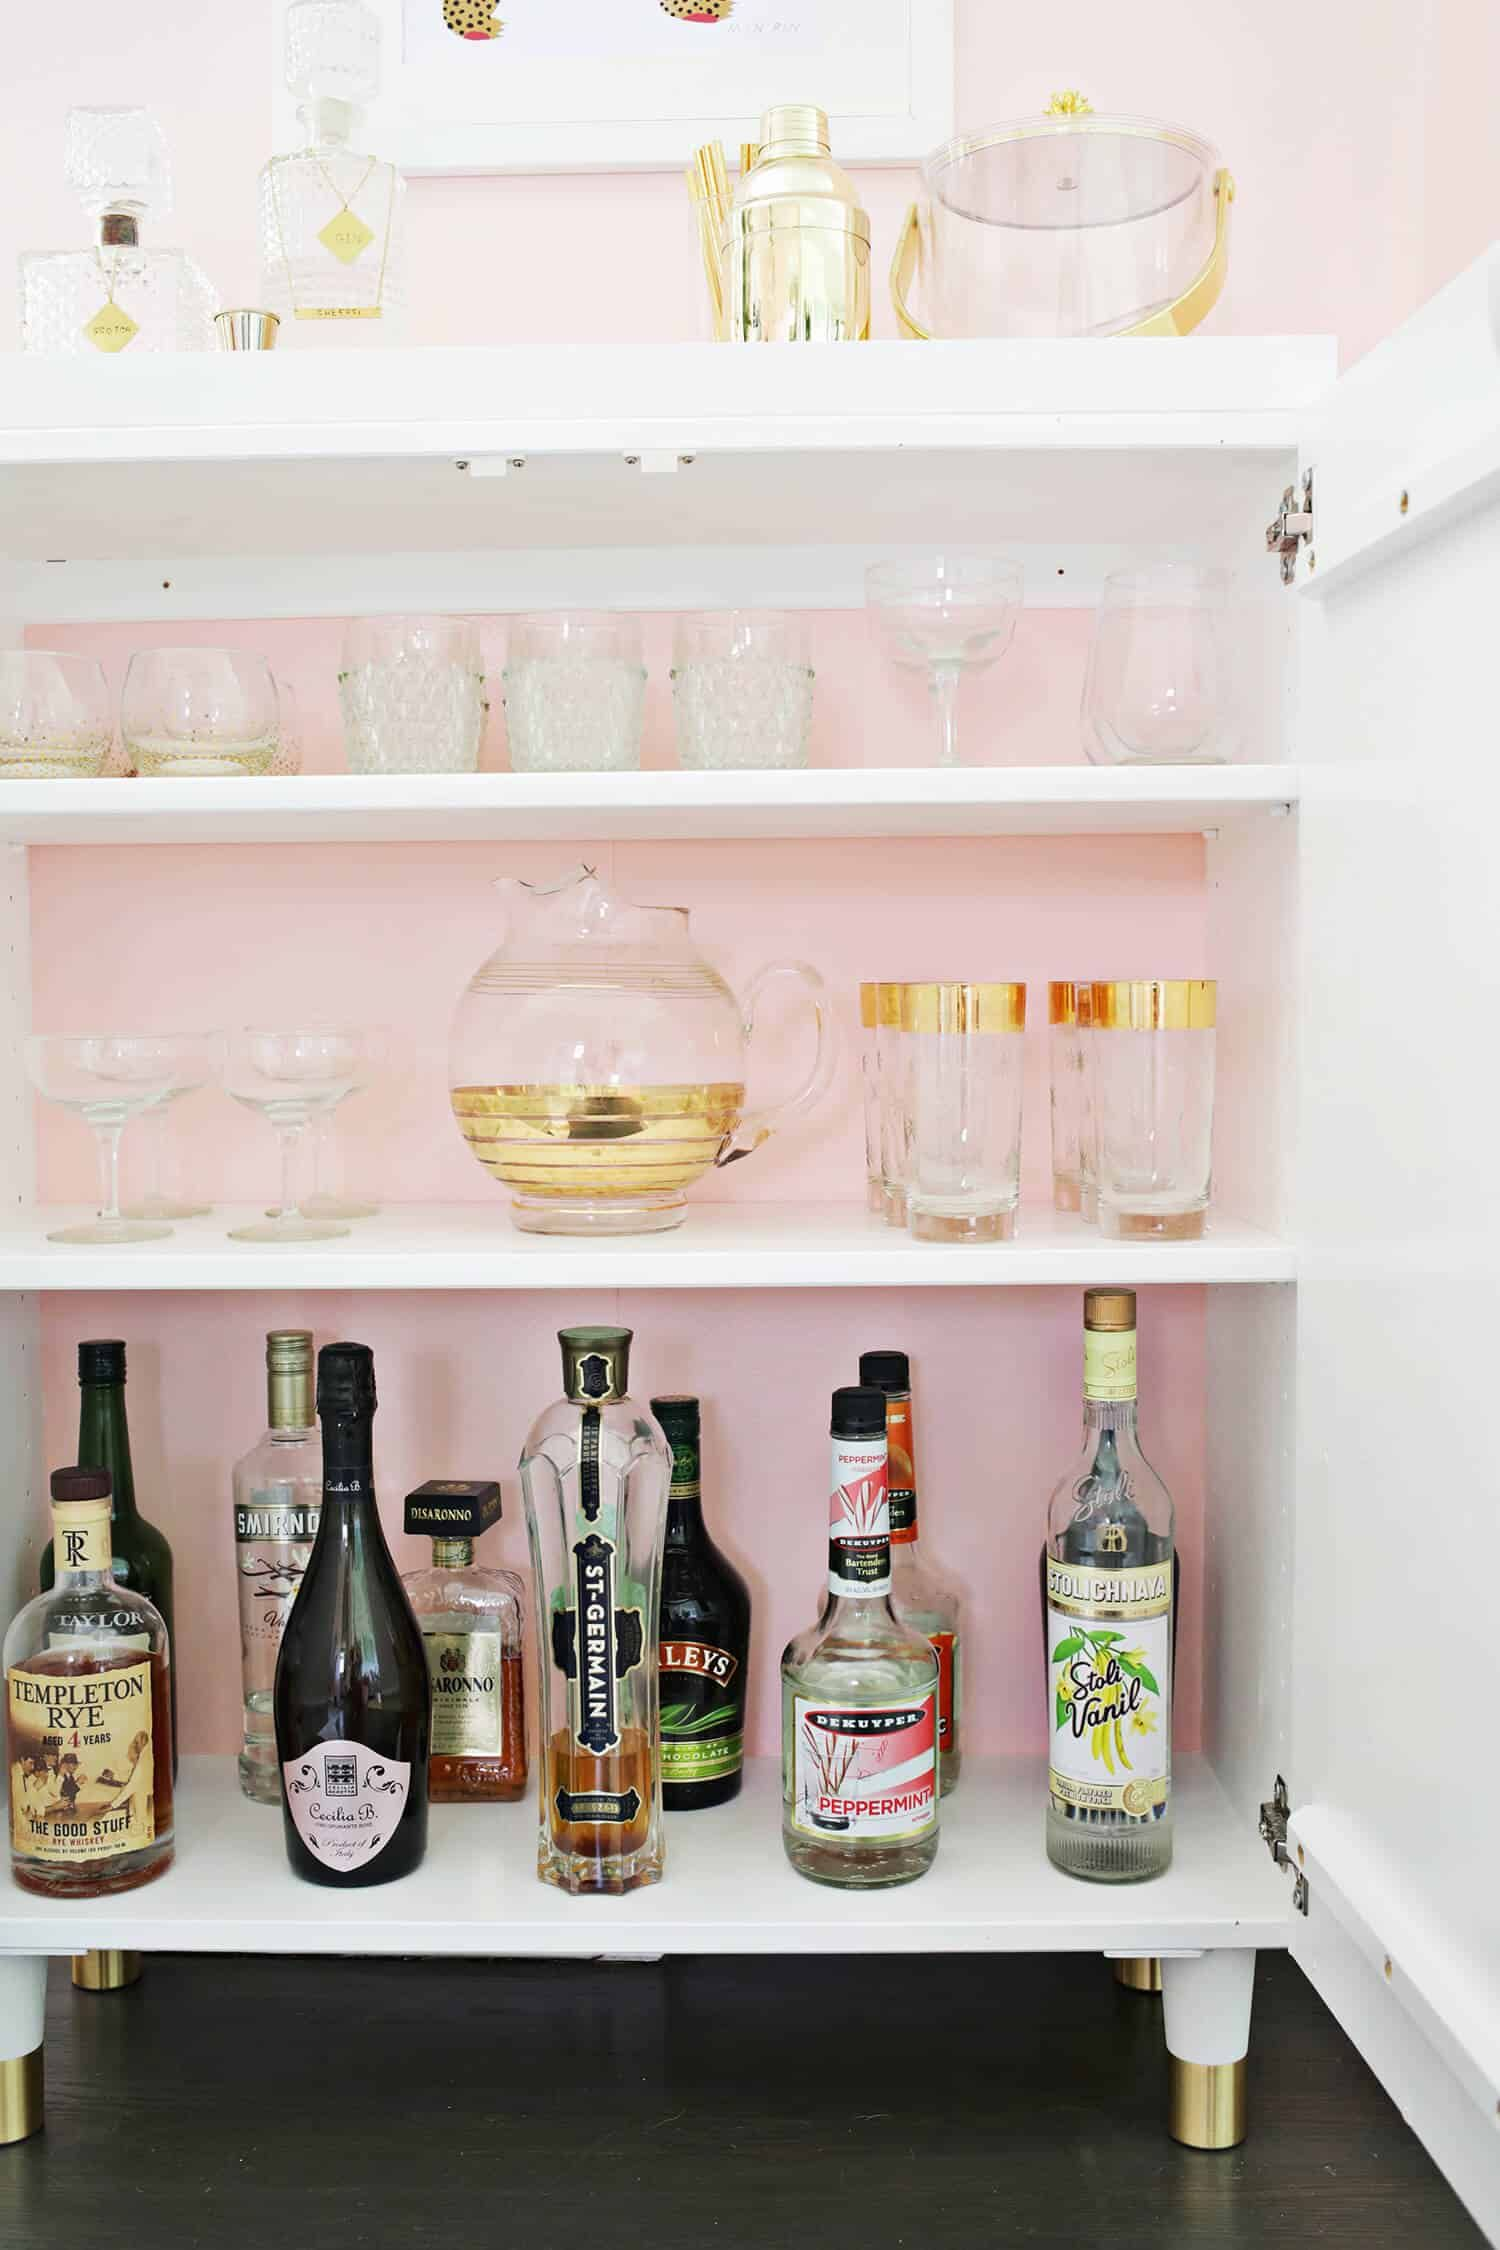 Ikea Ivar Cabinet Hack Turned Into A Bar Cabinet Ikea Ivar